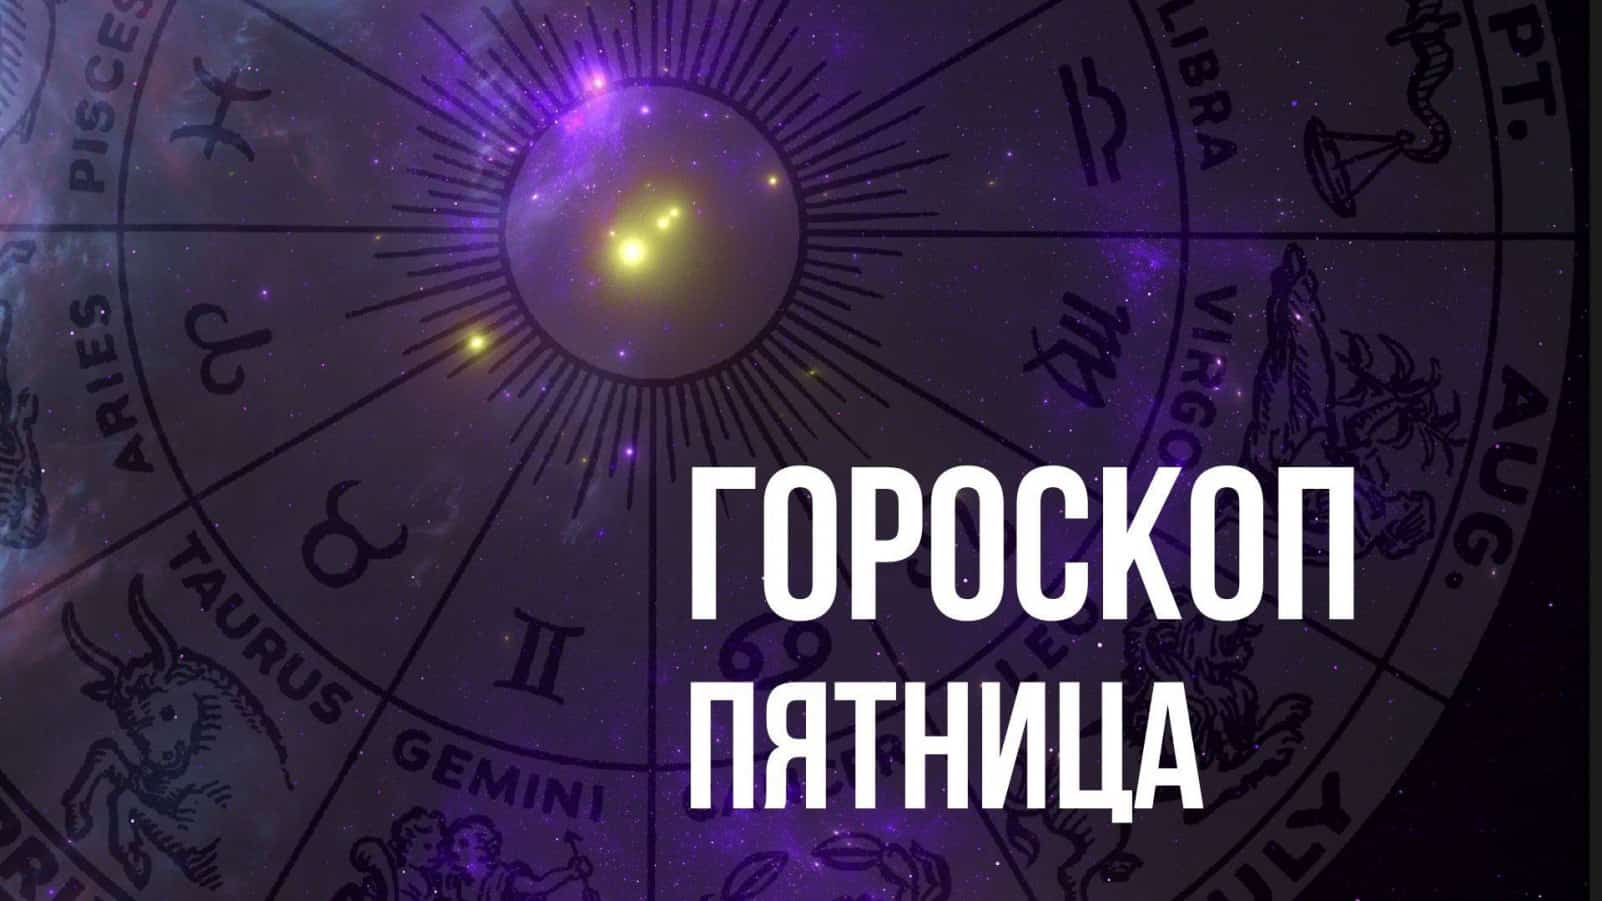 Гороскоп на пятницу 27 августа для каждого знака Зодиака